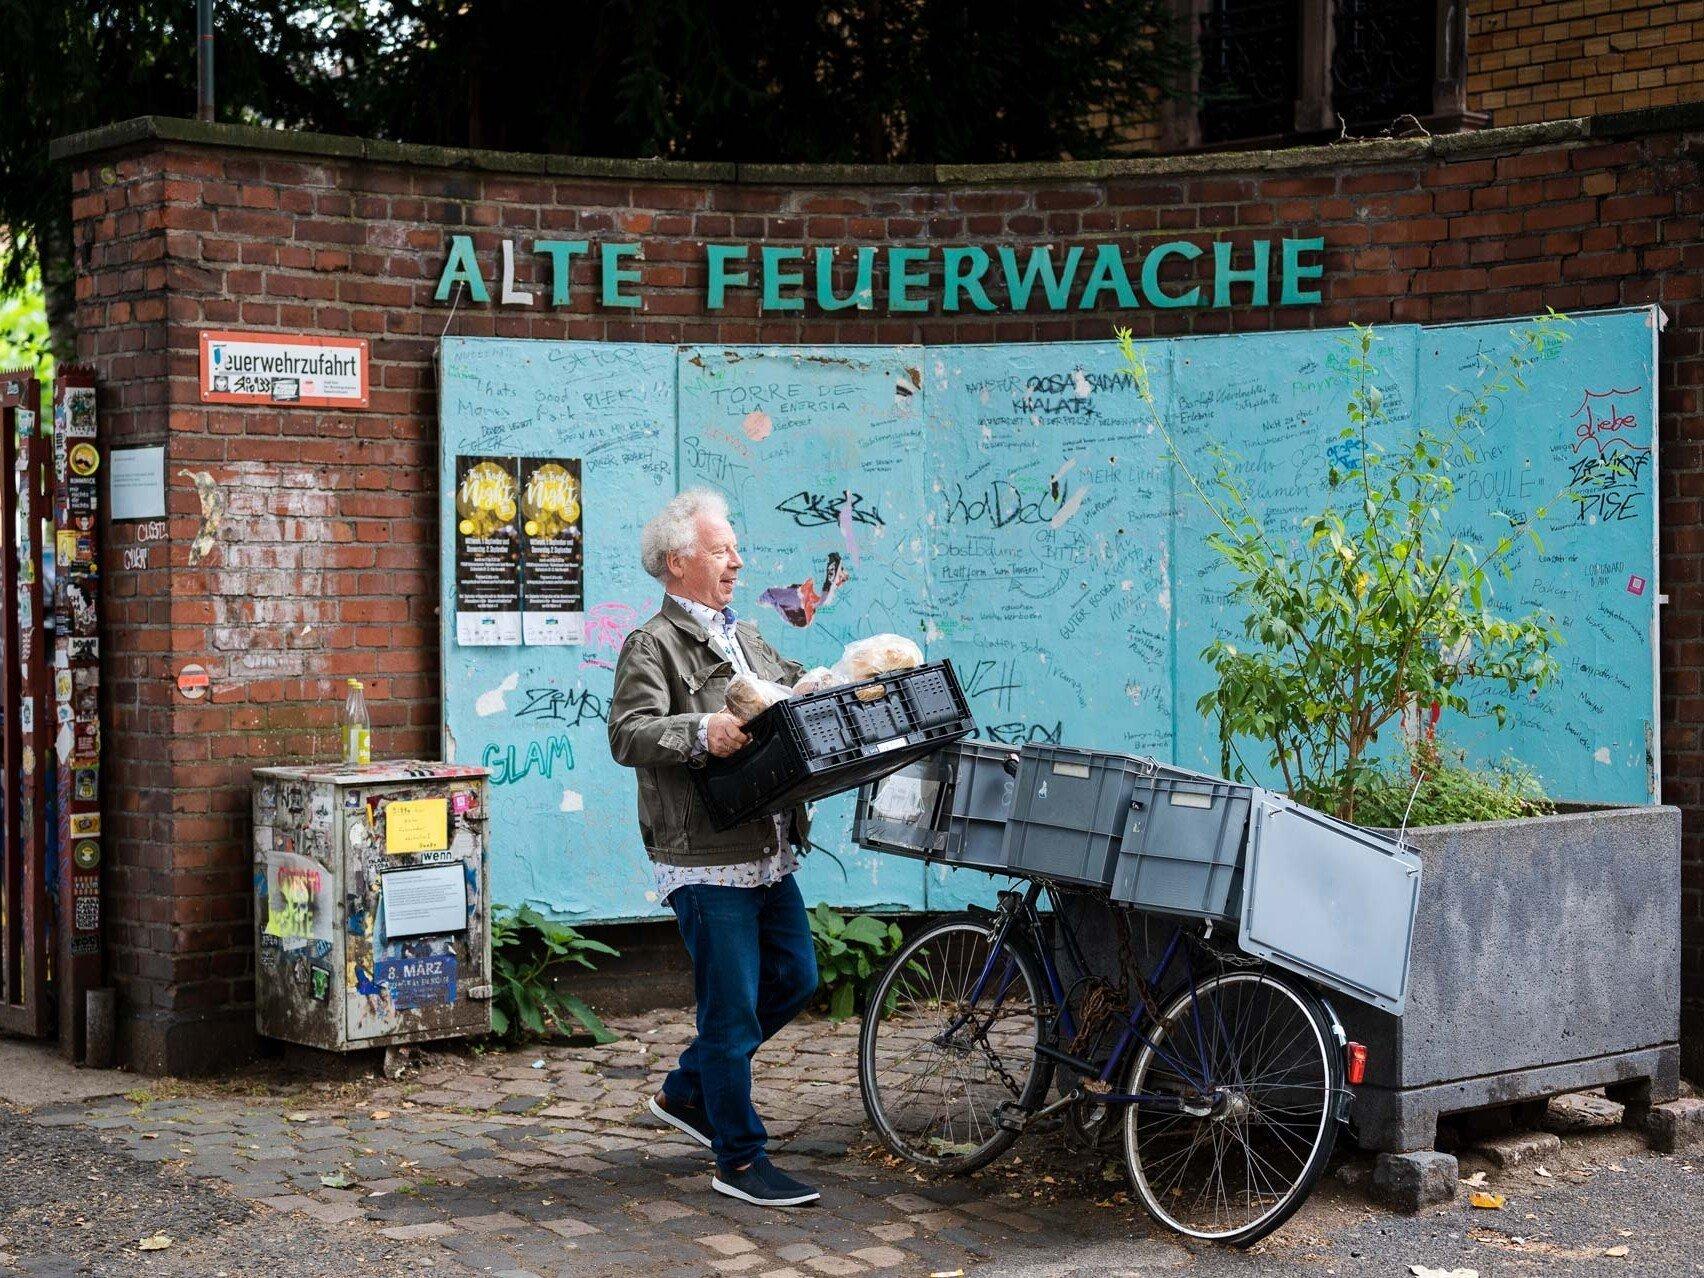 Christian Horsters bestückt auch den Fair-Teiler vor der Alten Feuerwache in Köln